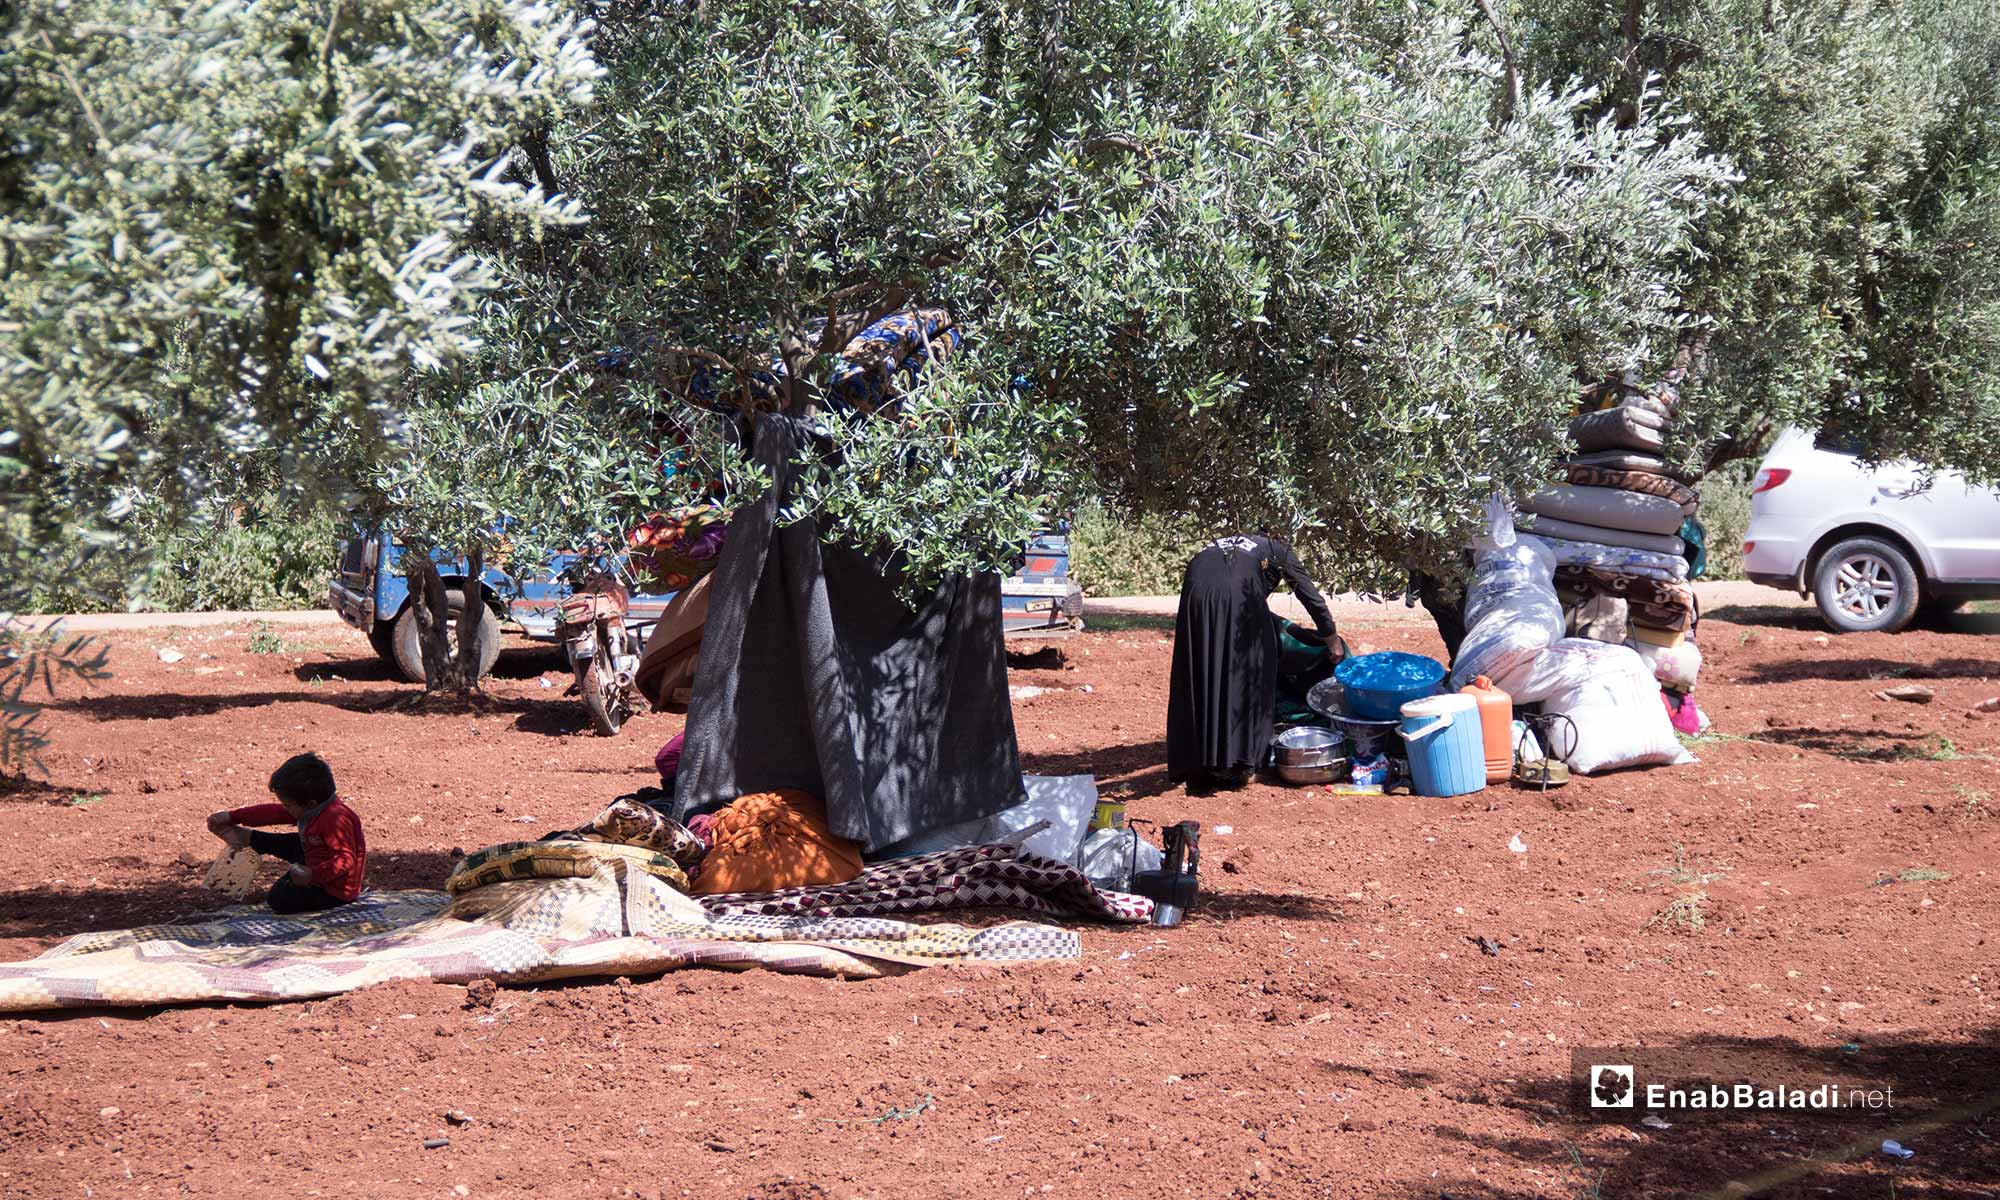 Civilians from Idlib resorting to the Syrian-Turkish borders, fleeing the bombardment – May 3, 2019 (Enab Baladi)